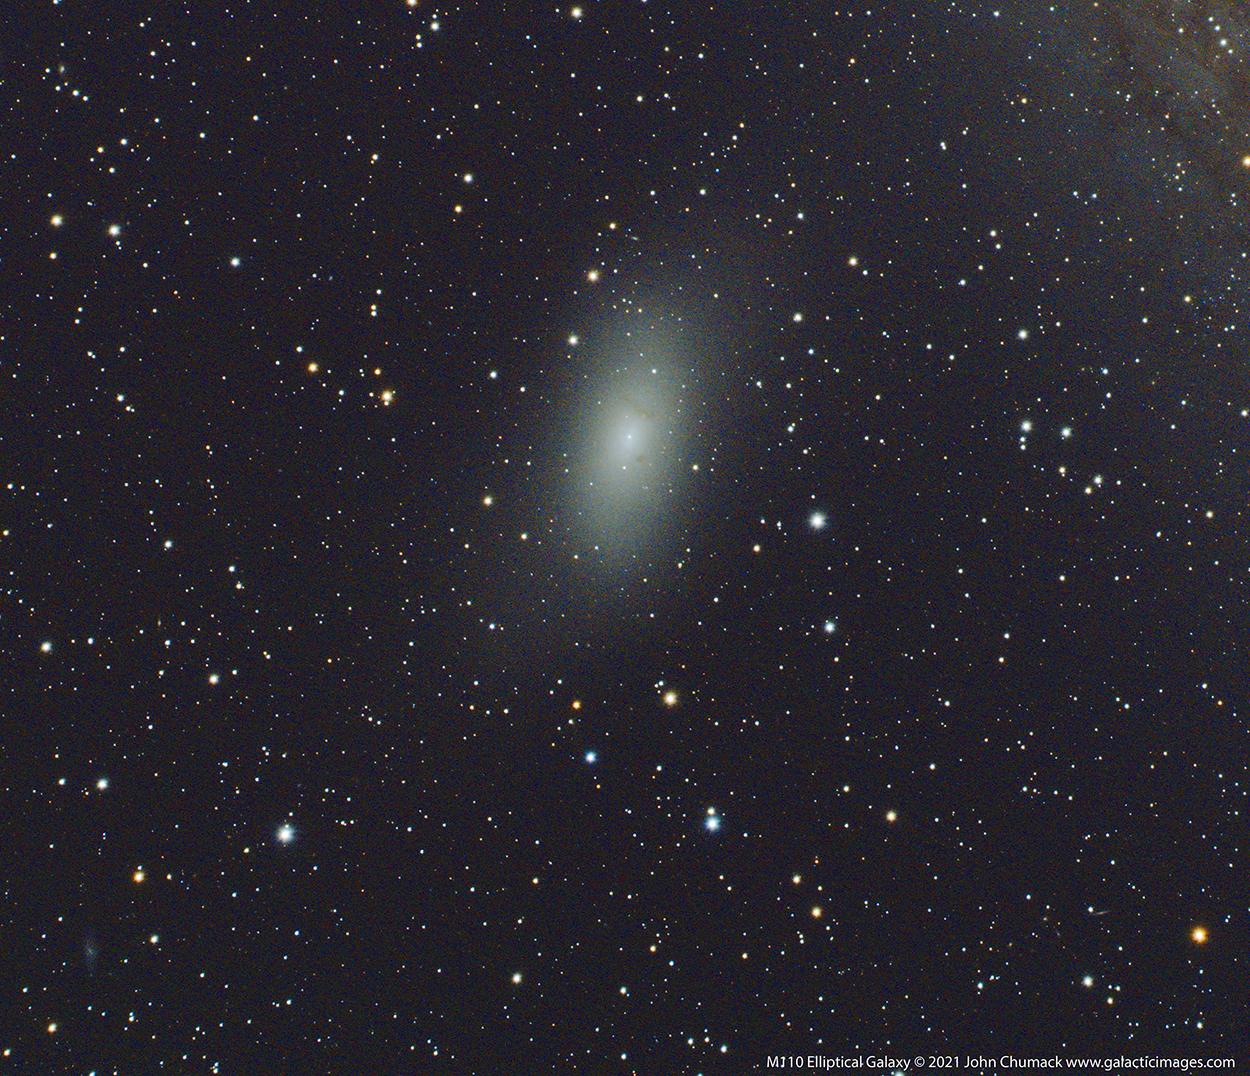 M110 Andromeda Elliptical Galaxy